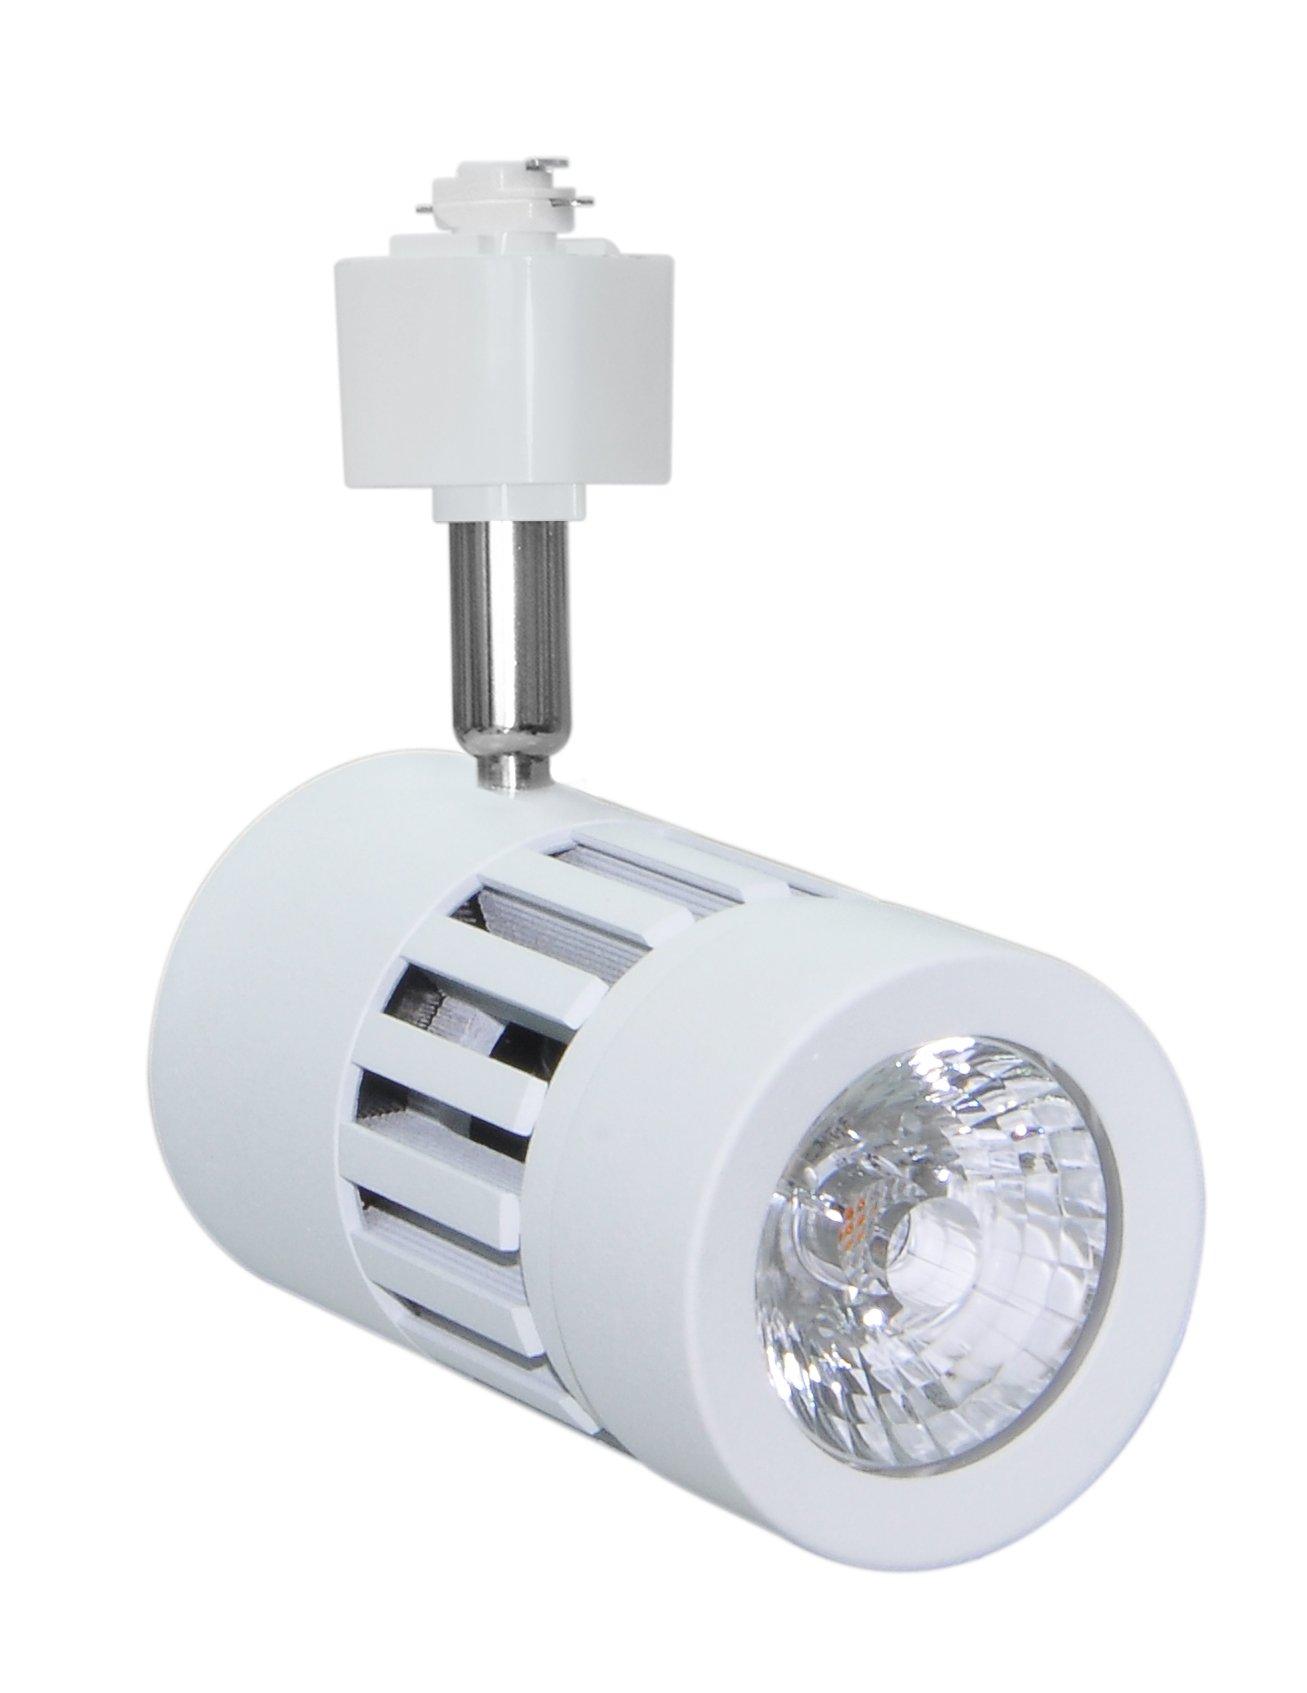 Infinity Green Lighting IG-TR011 9W 3-Wire Round LED H Type Track Head Lighting (White, 5000K)